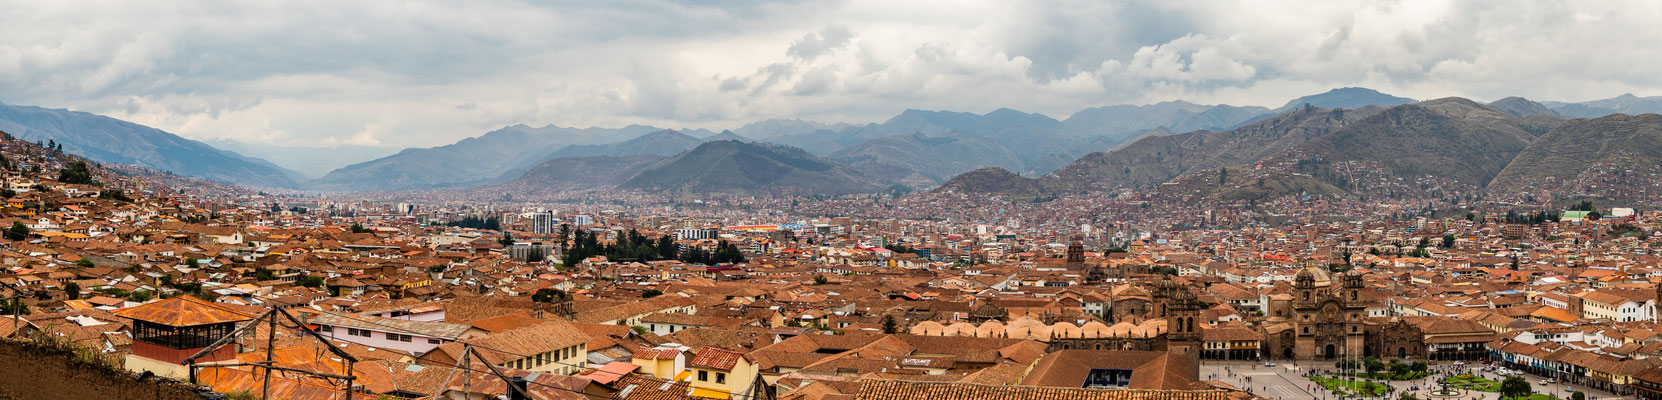 Panorama vom Mirador San Cristobal, Cusco, Nov. 2019